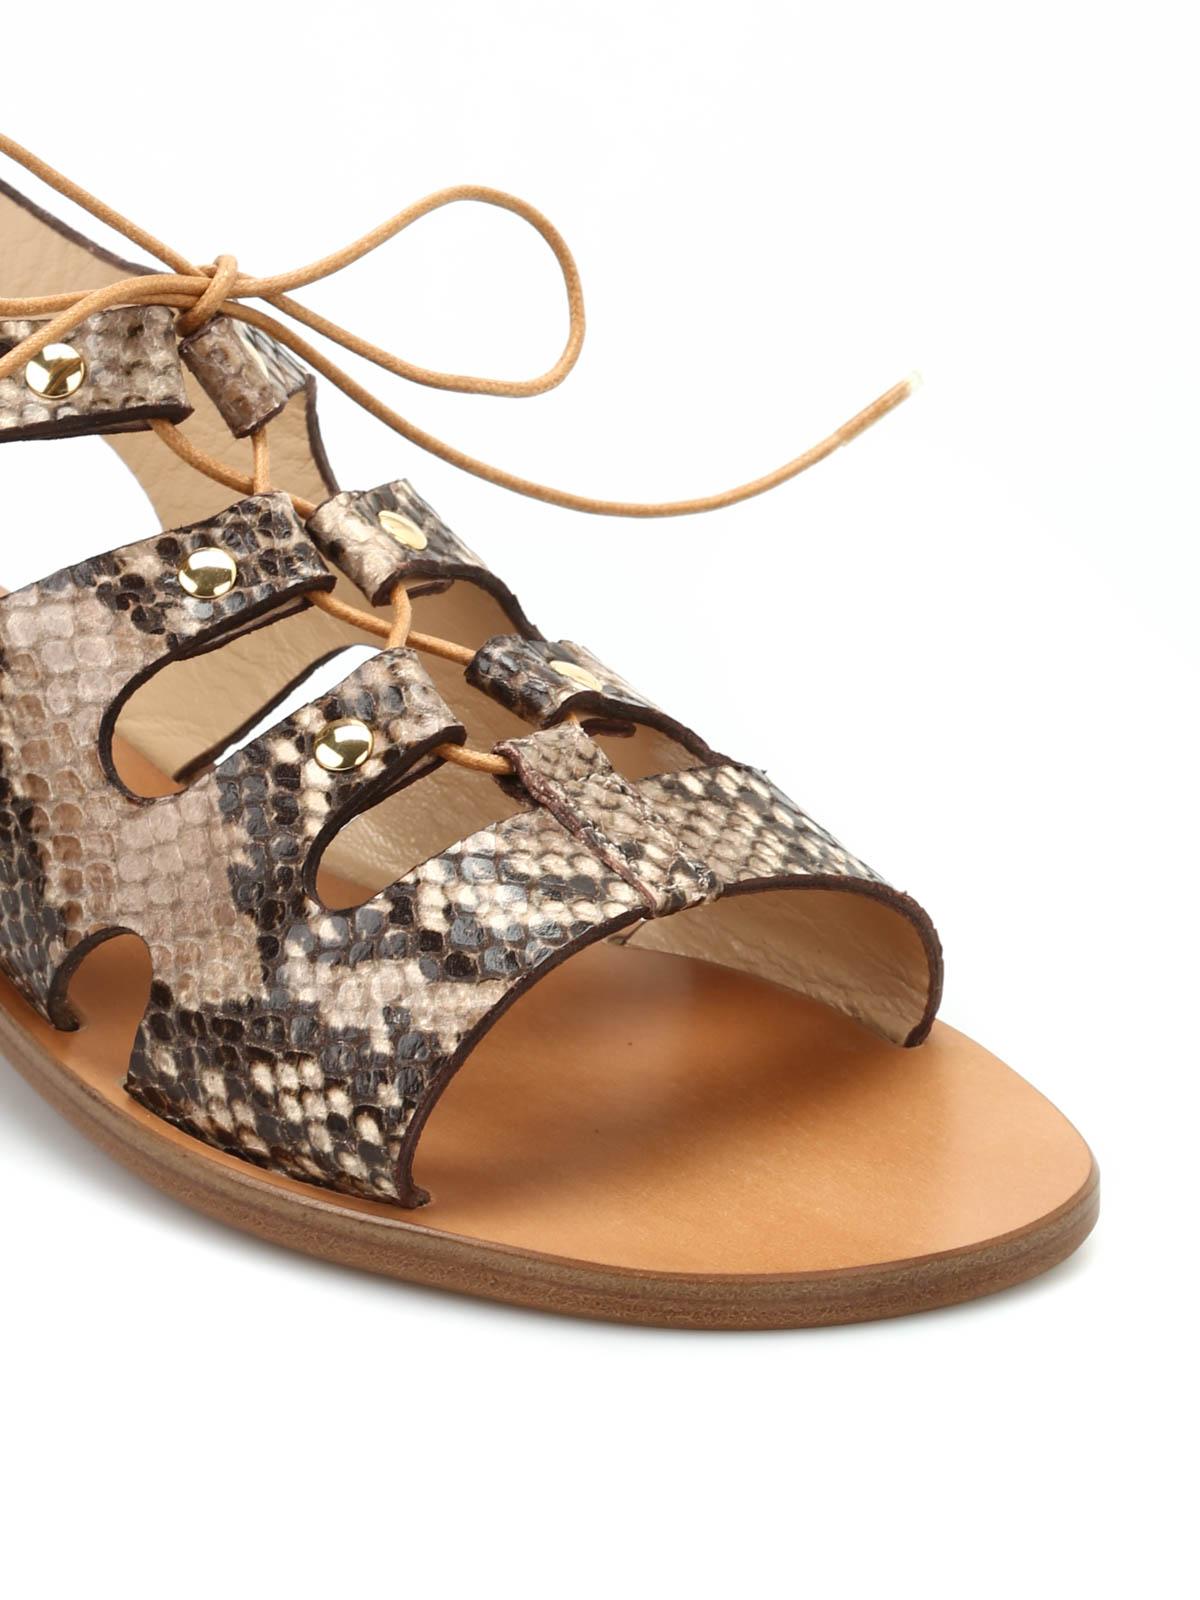 9bf893ca36006a Parlanti snake print sandals namibia rosa jpg 1200x1600 Snake print shoes  for women